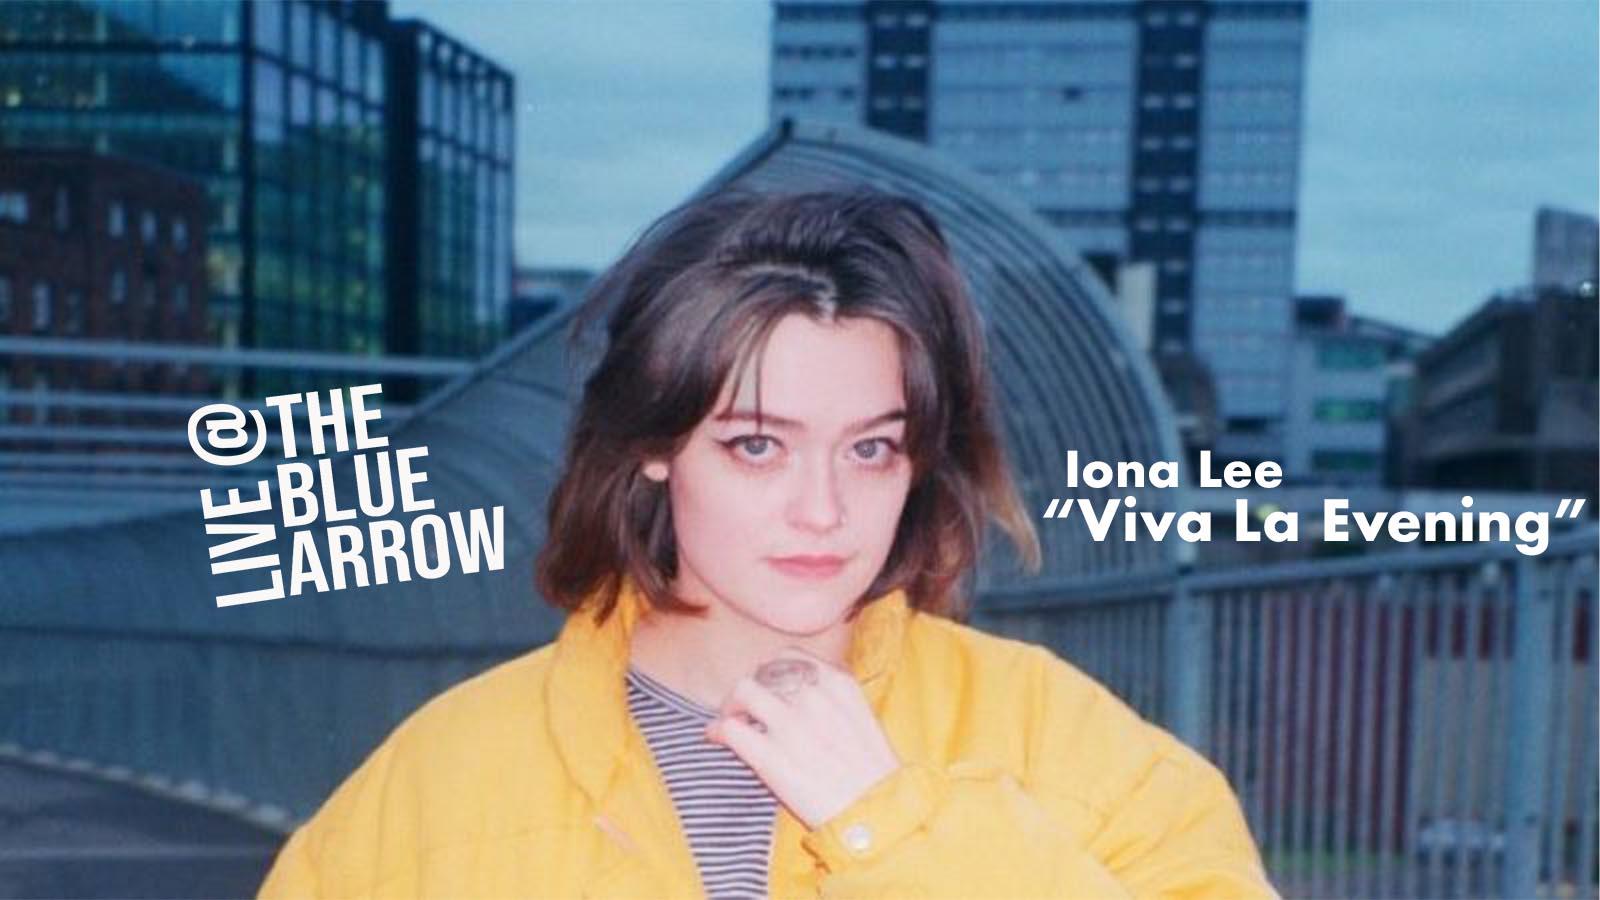 Iona Lee - Viva La Evening - Live at The Blue Arrow